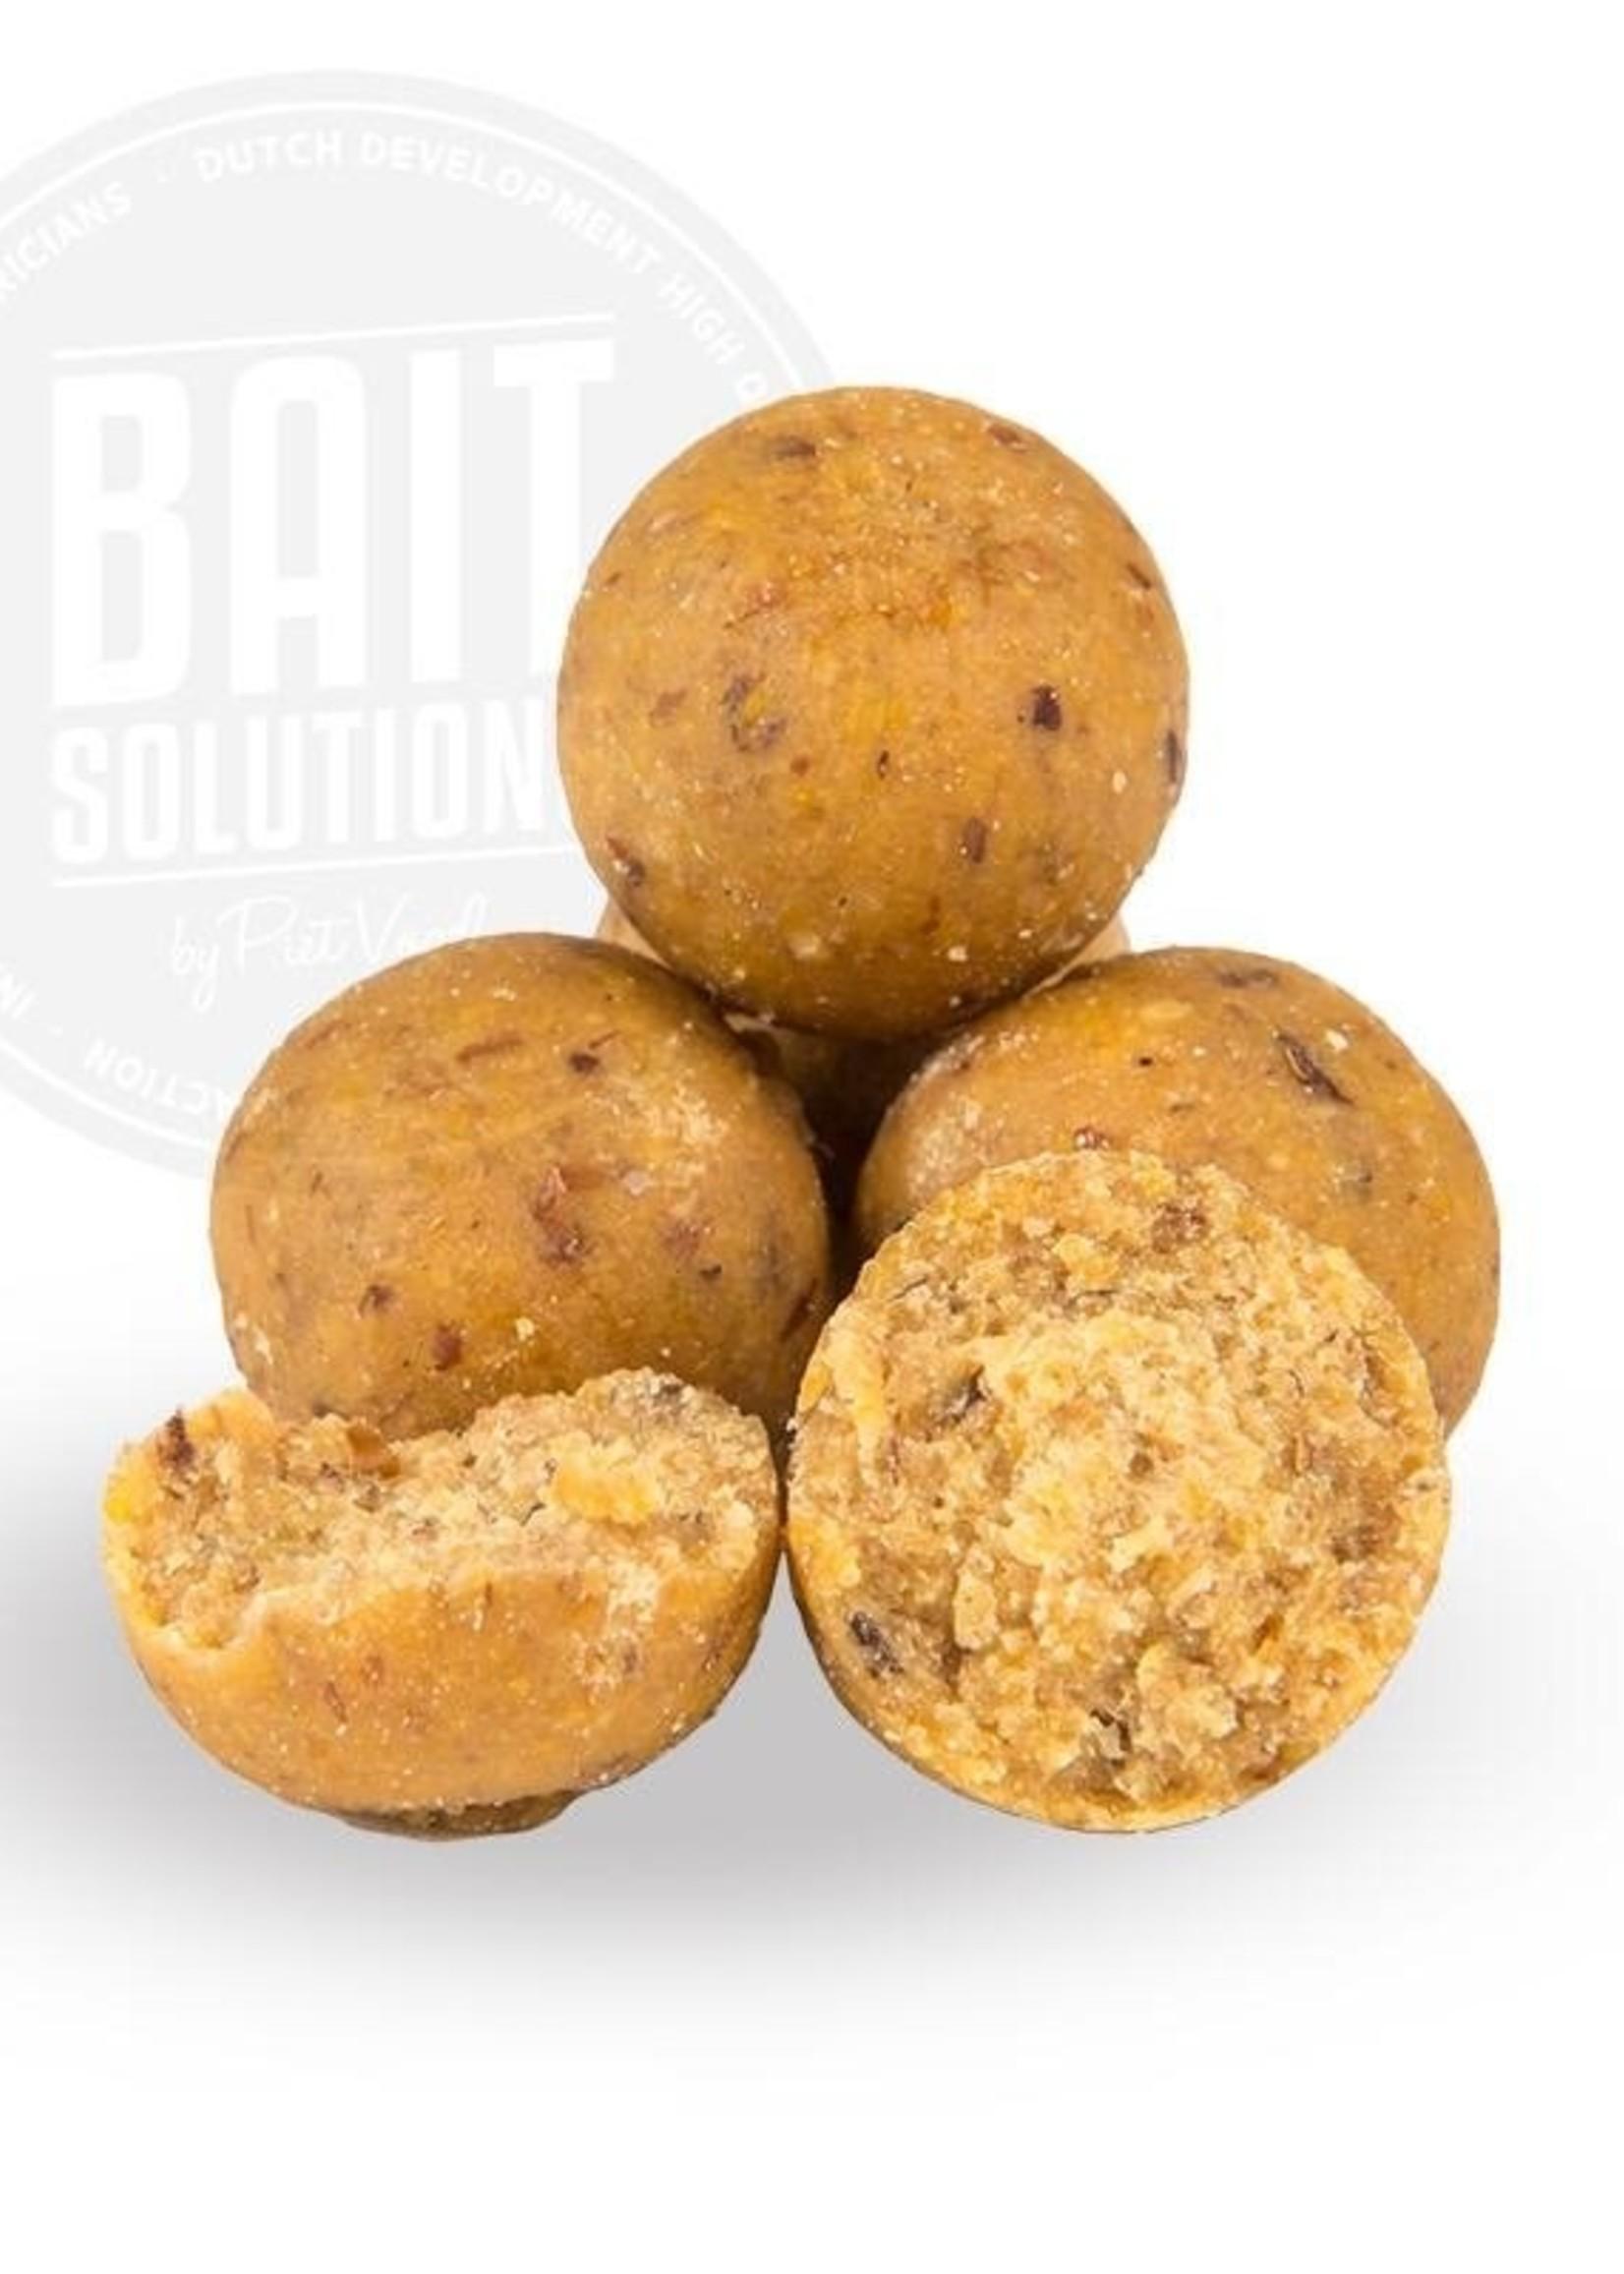 Baitsolutions Scopex & Butyric Acid Boilies 2,5 kg